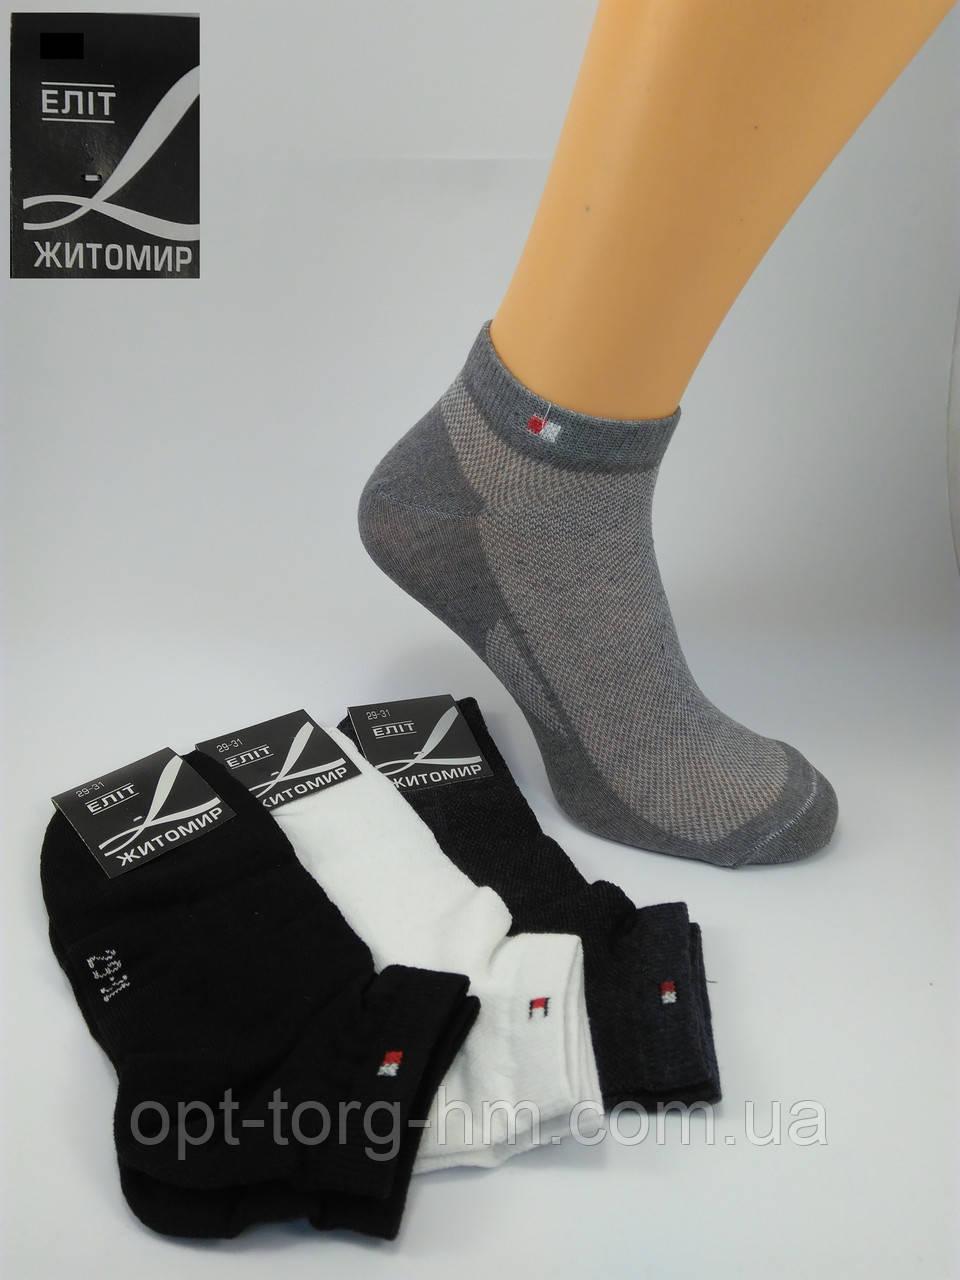 Мужские носки спорт сетка 29-31 (43-45ОБУВЬ)